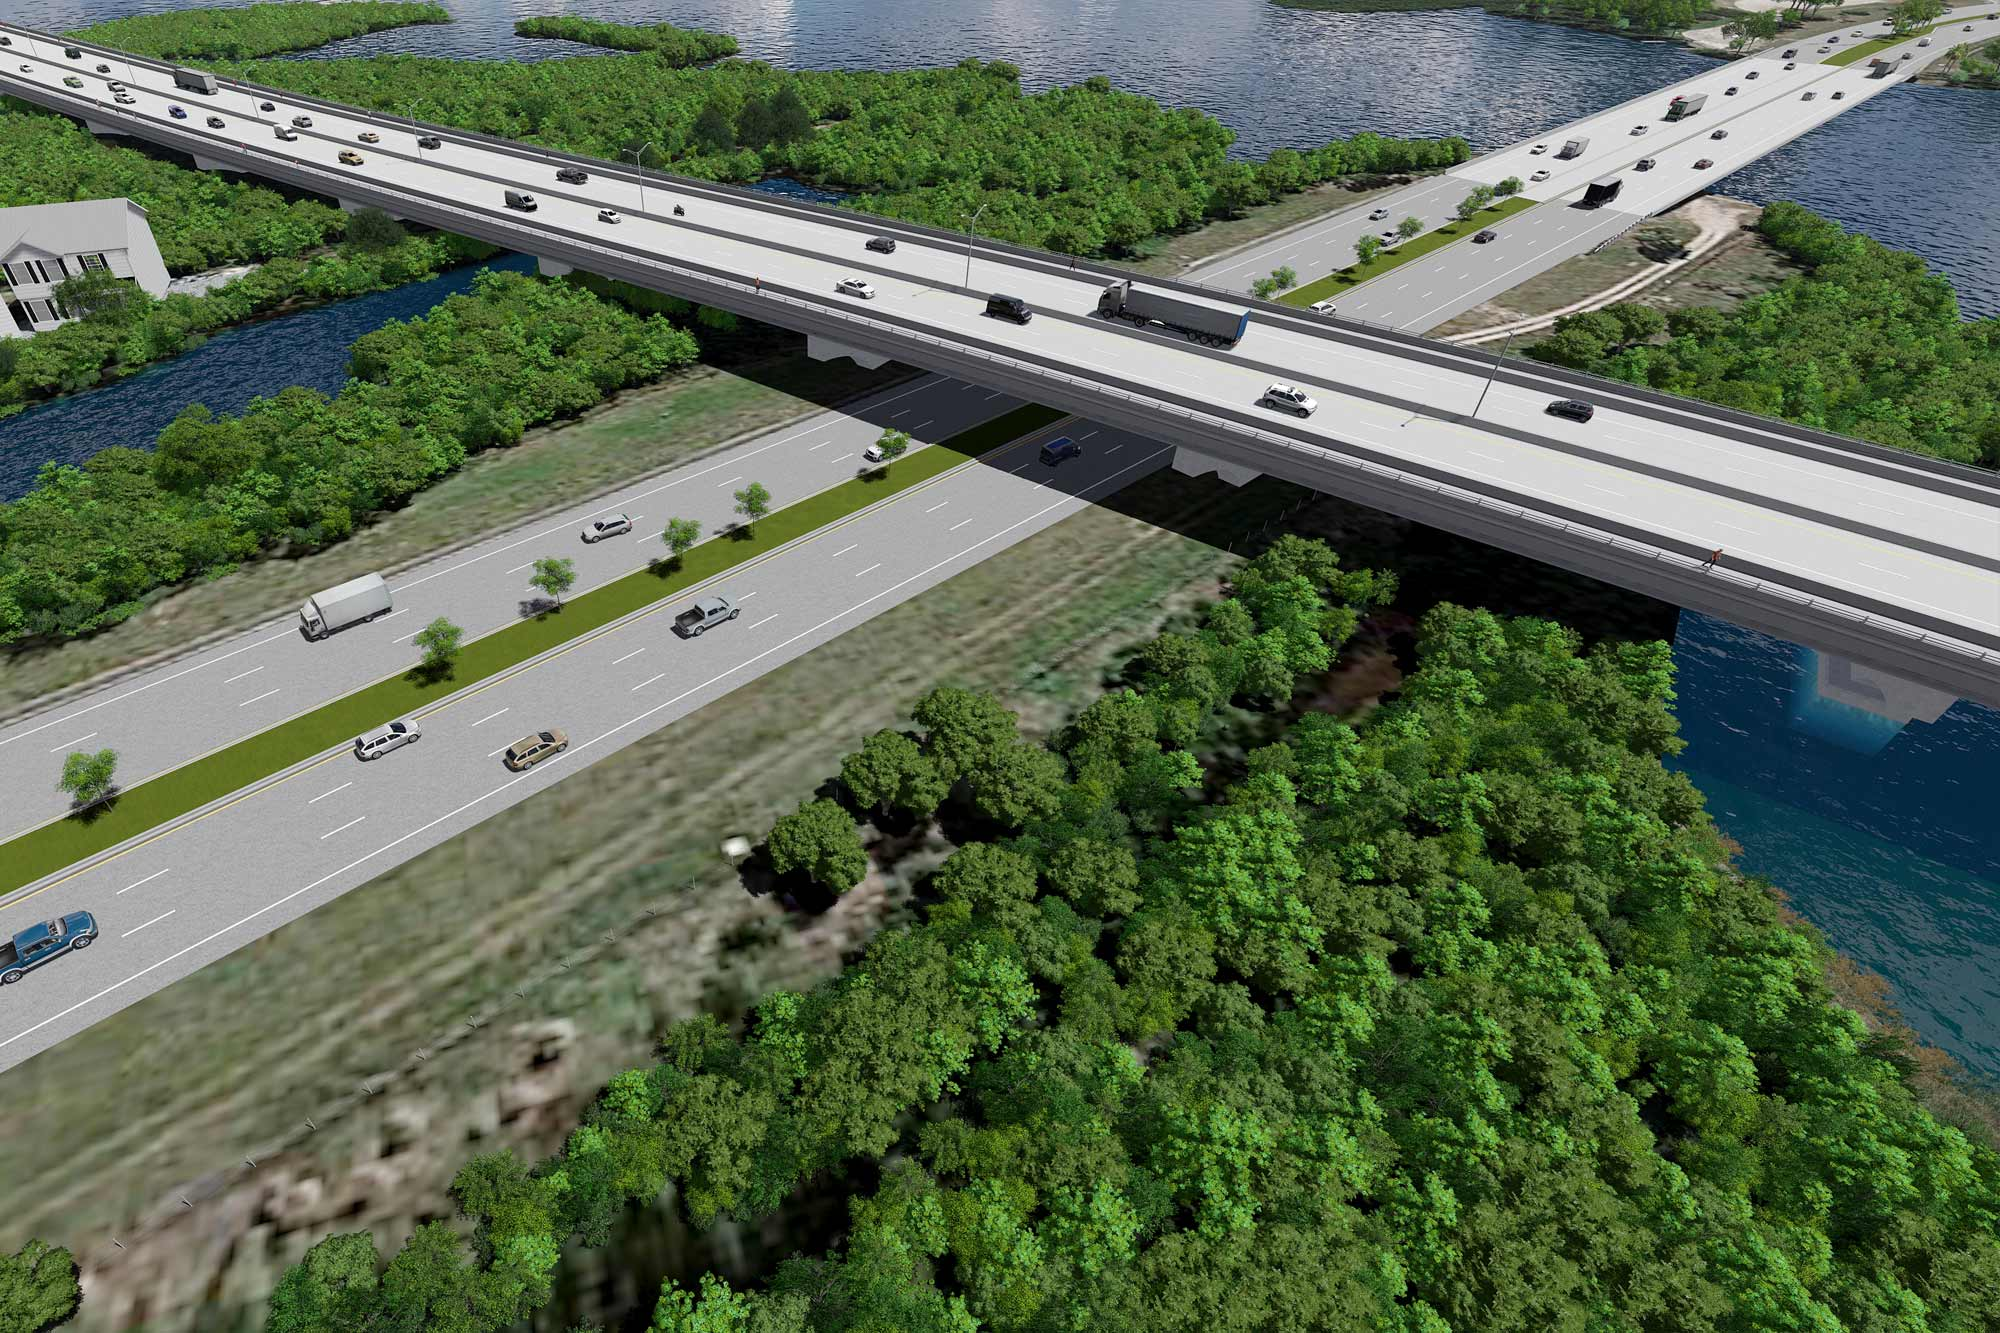 Bridge over Roadway